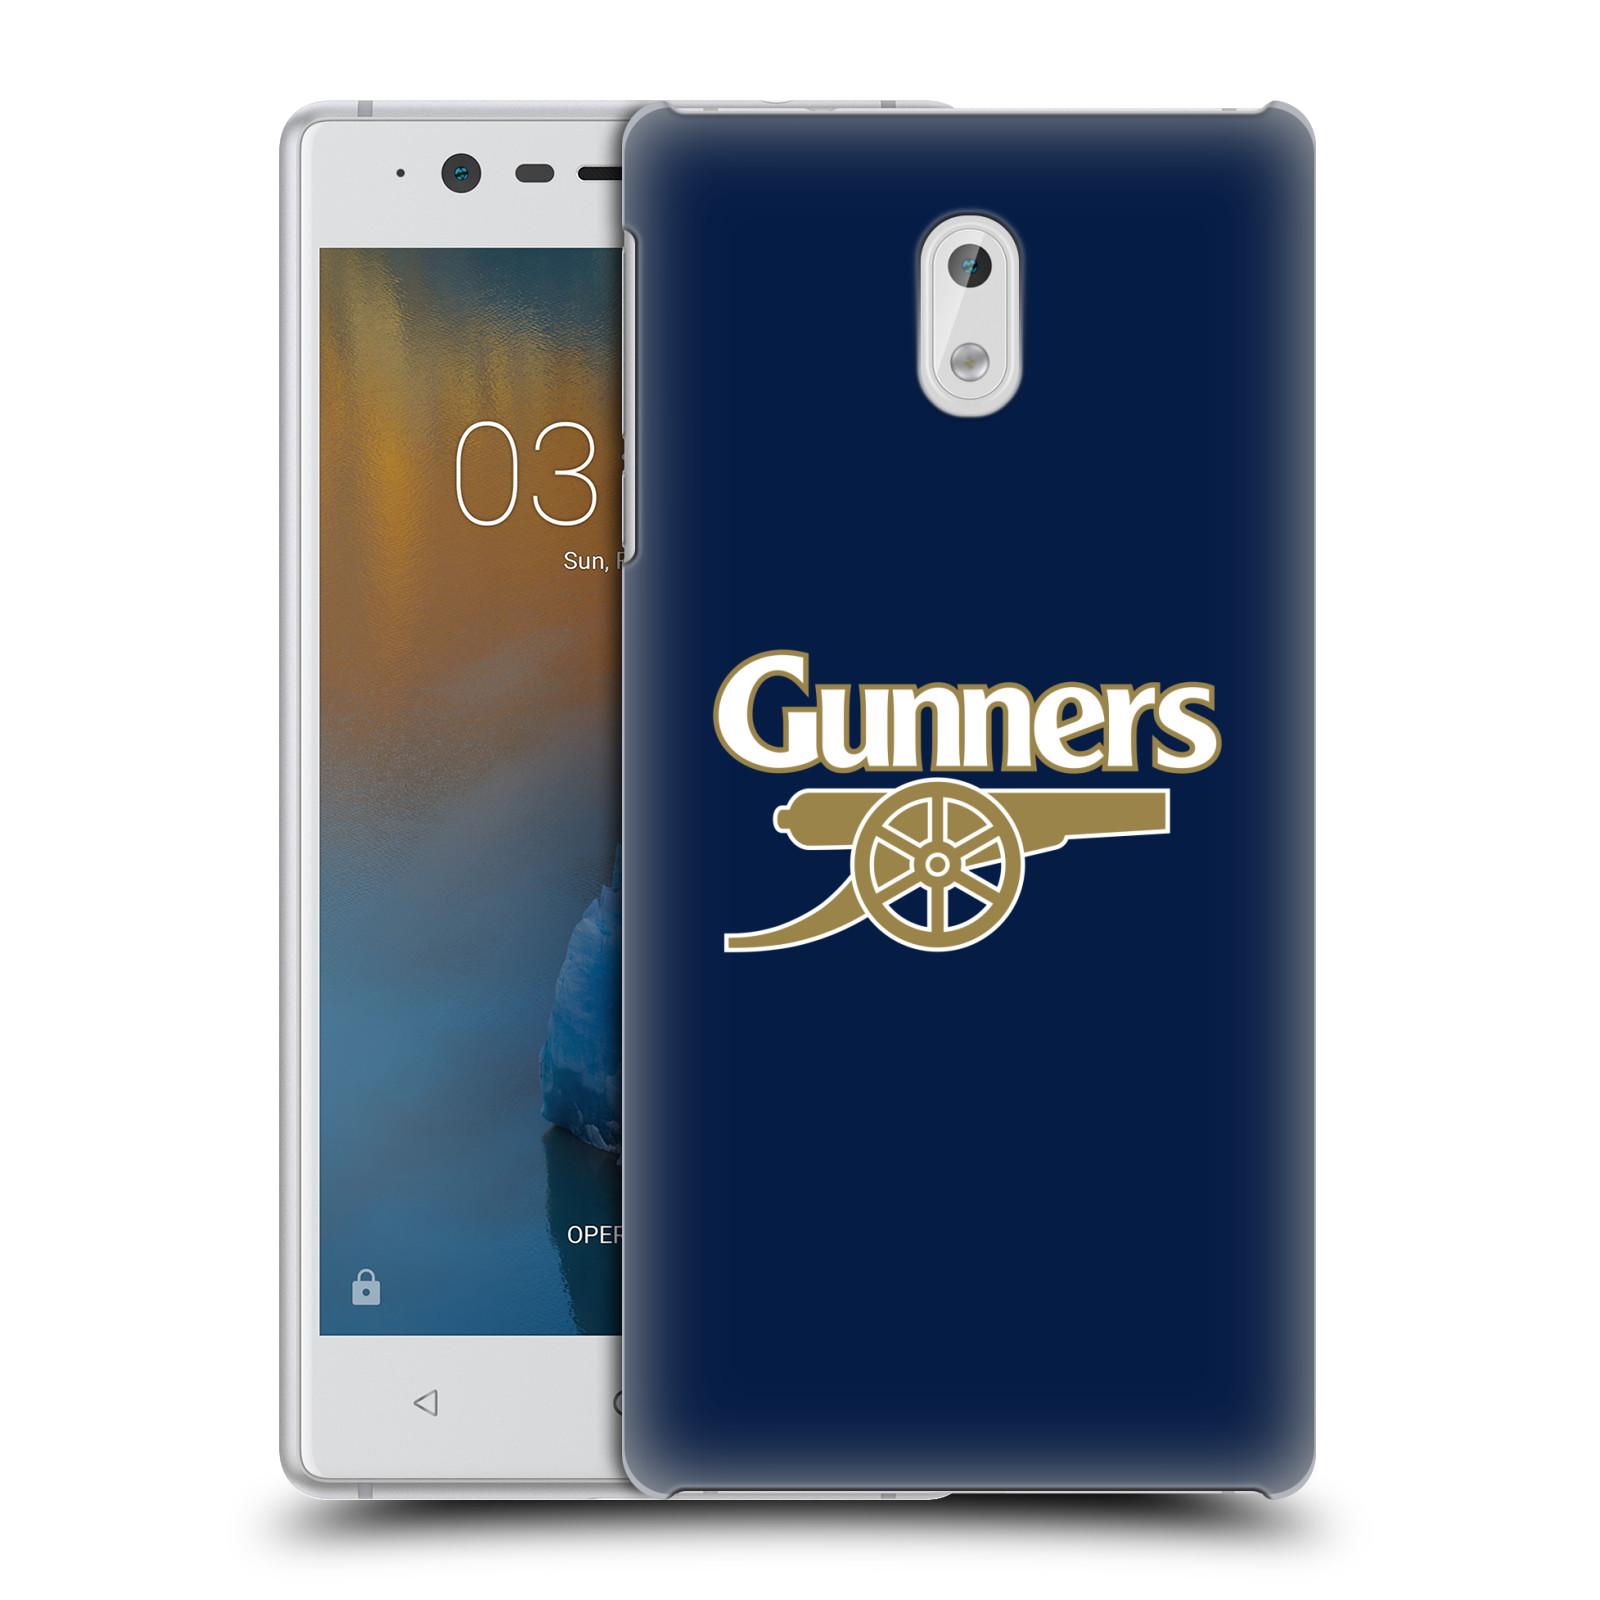 Plastové pouzdro na mobil Nokia 3 Head Case - Arsenal FC - Gunners